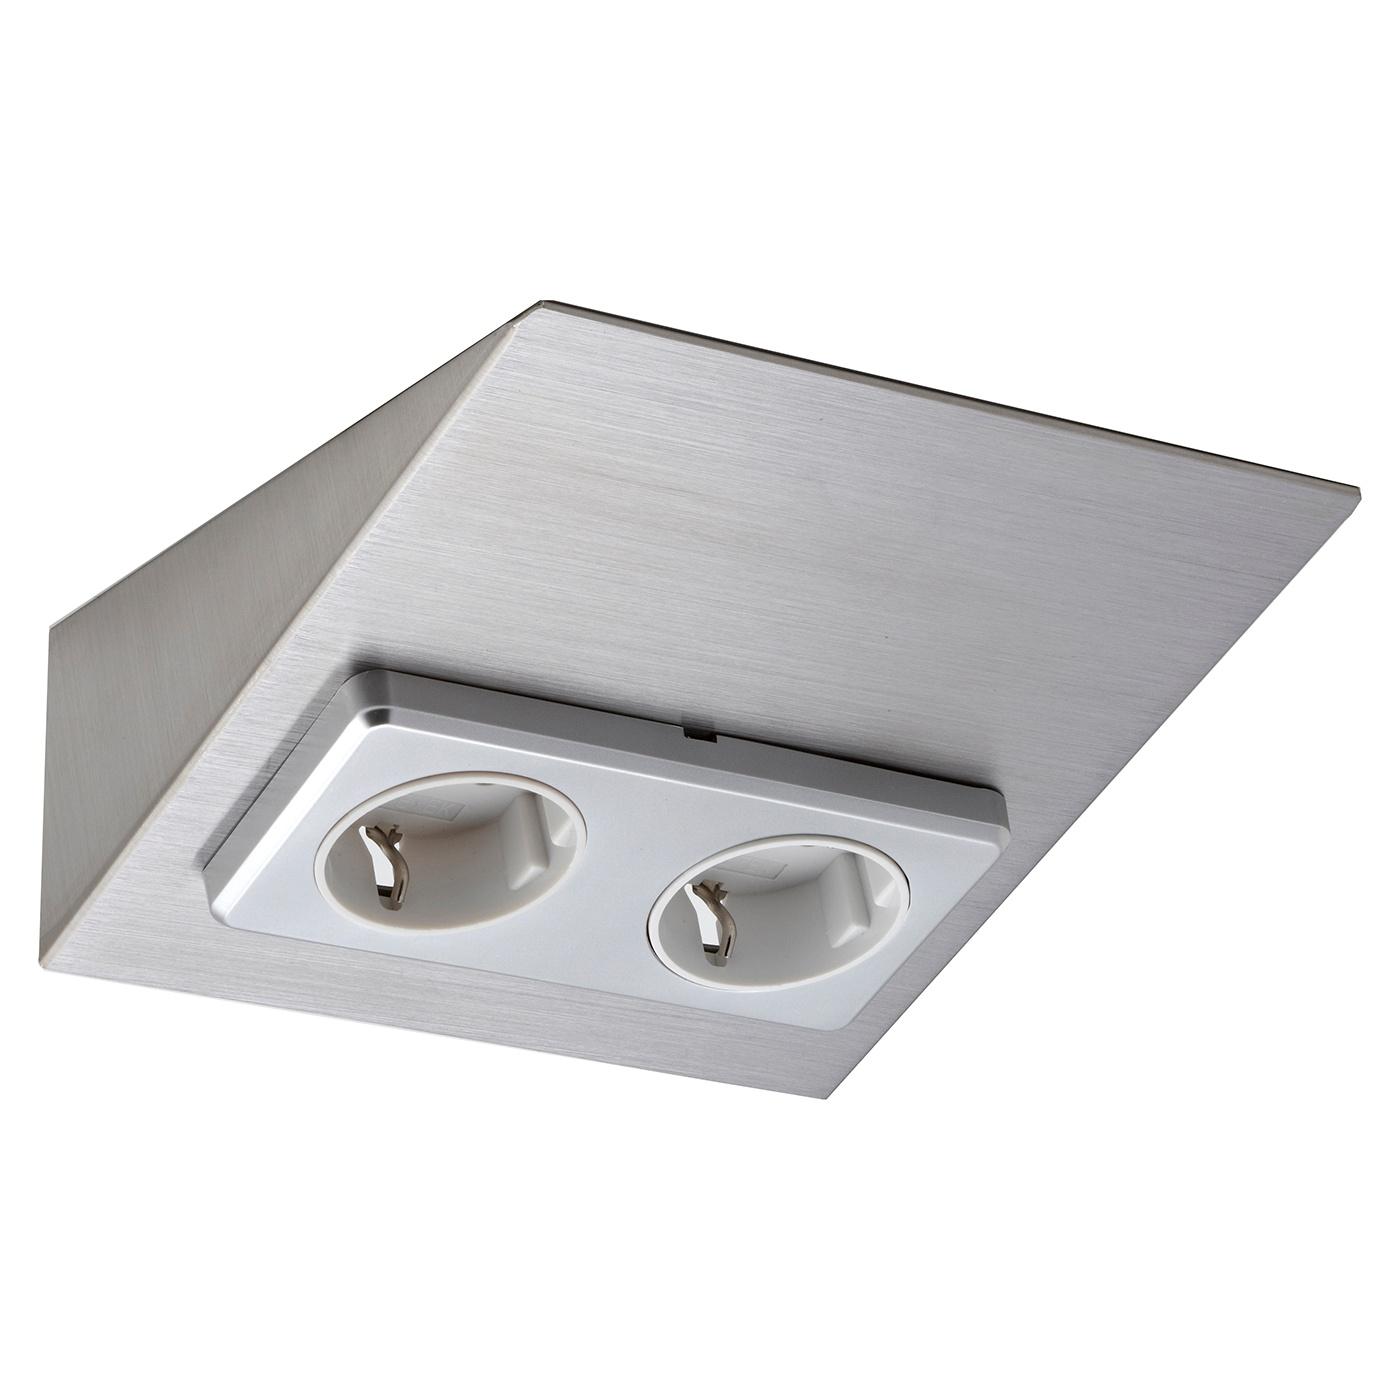 Pistorasia Limente Mini 2 16 A 230 V IP20 150×164 mm 2 osainen RST  Taloon com